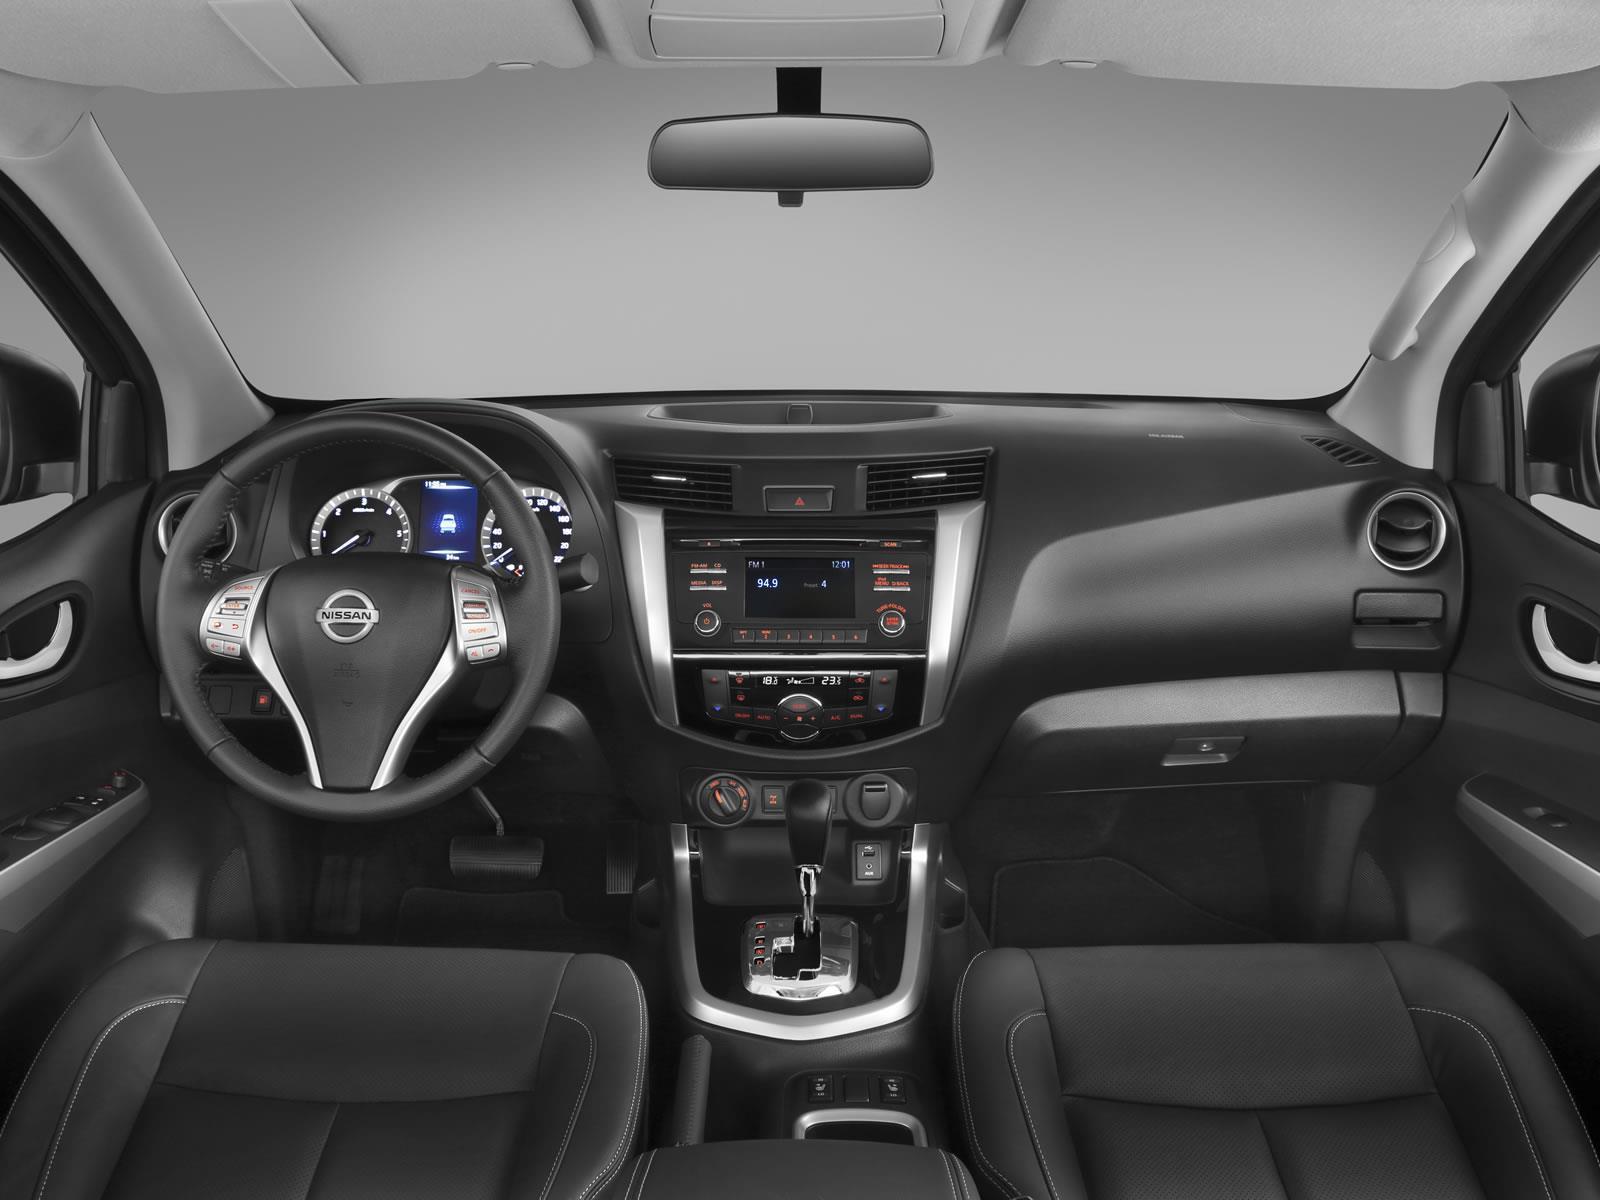 Nissan Np300 Frontier Di Sel 2017 Llega A M Xico Desde 284 700 Pesos